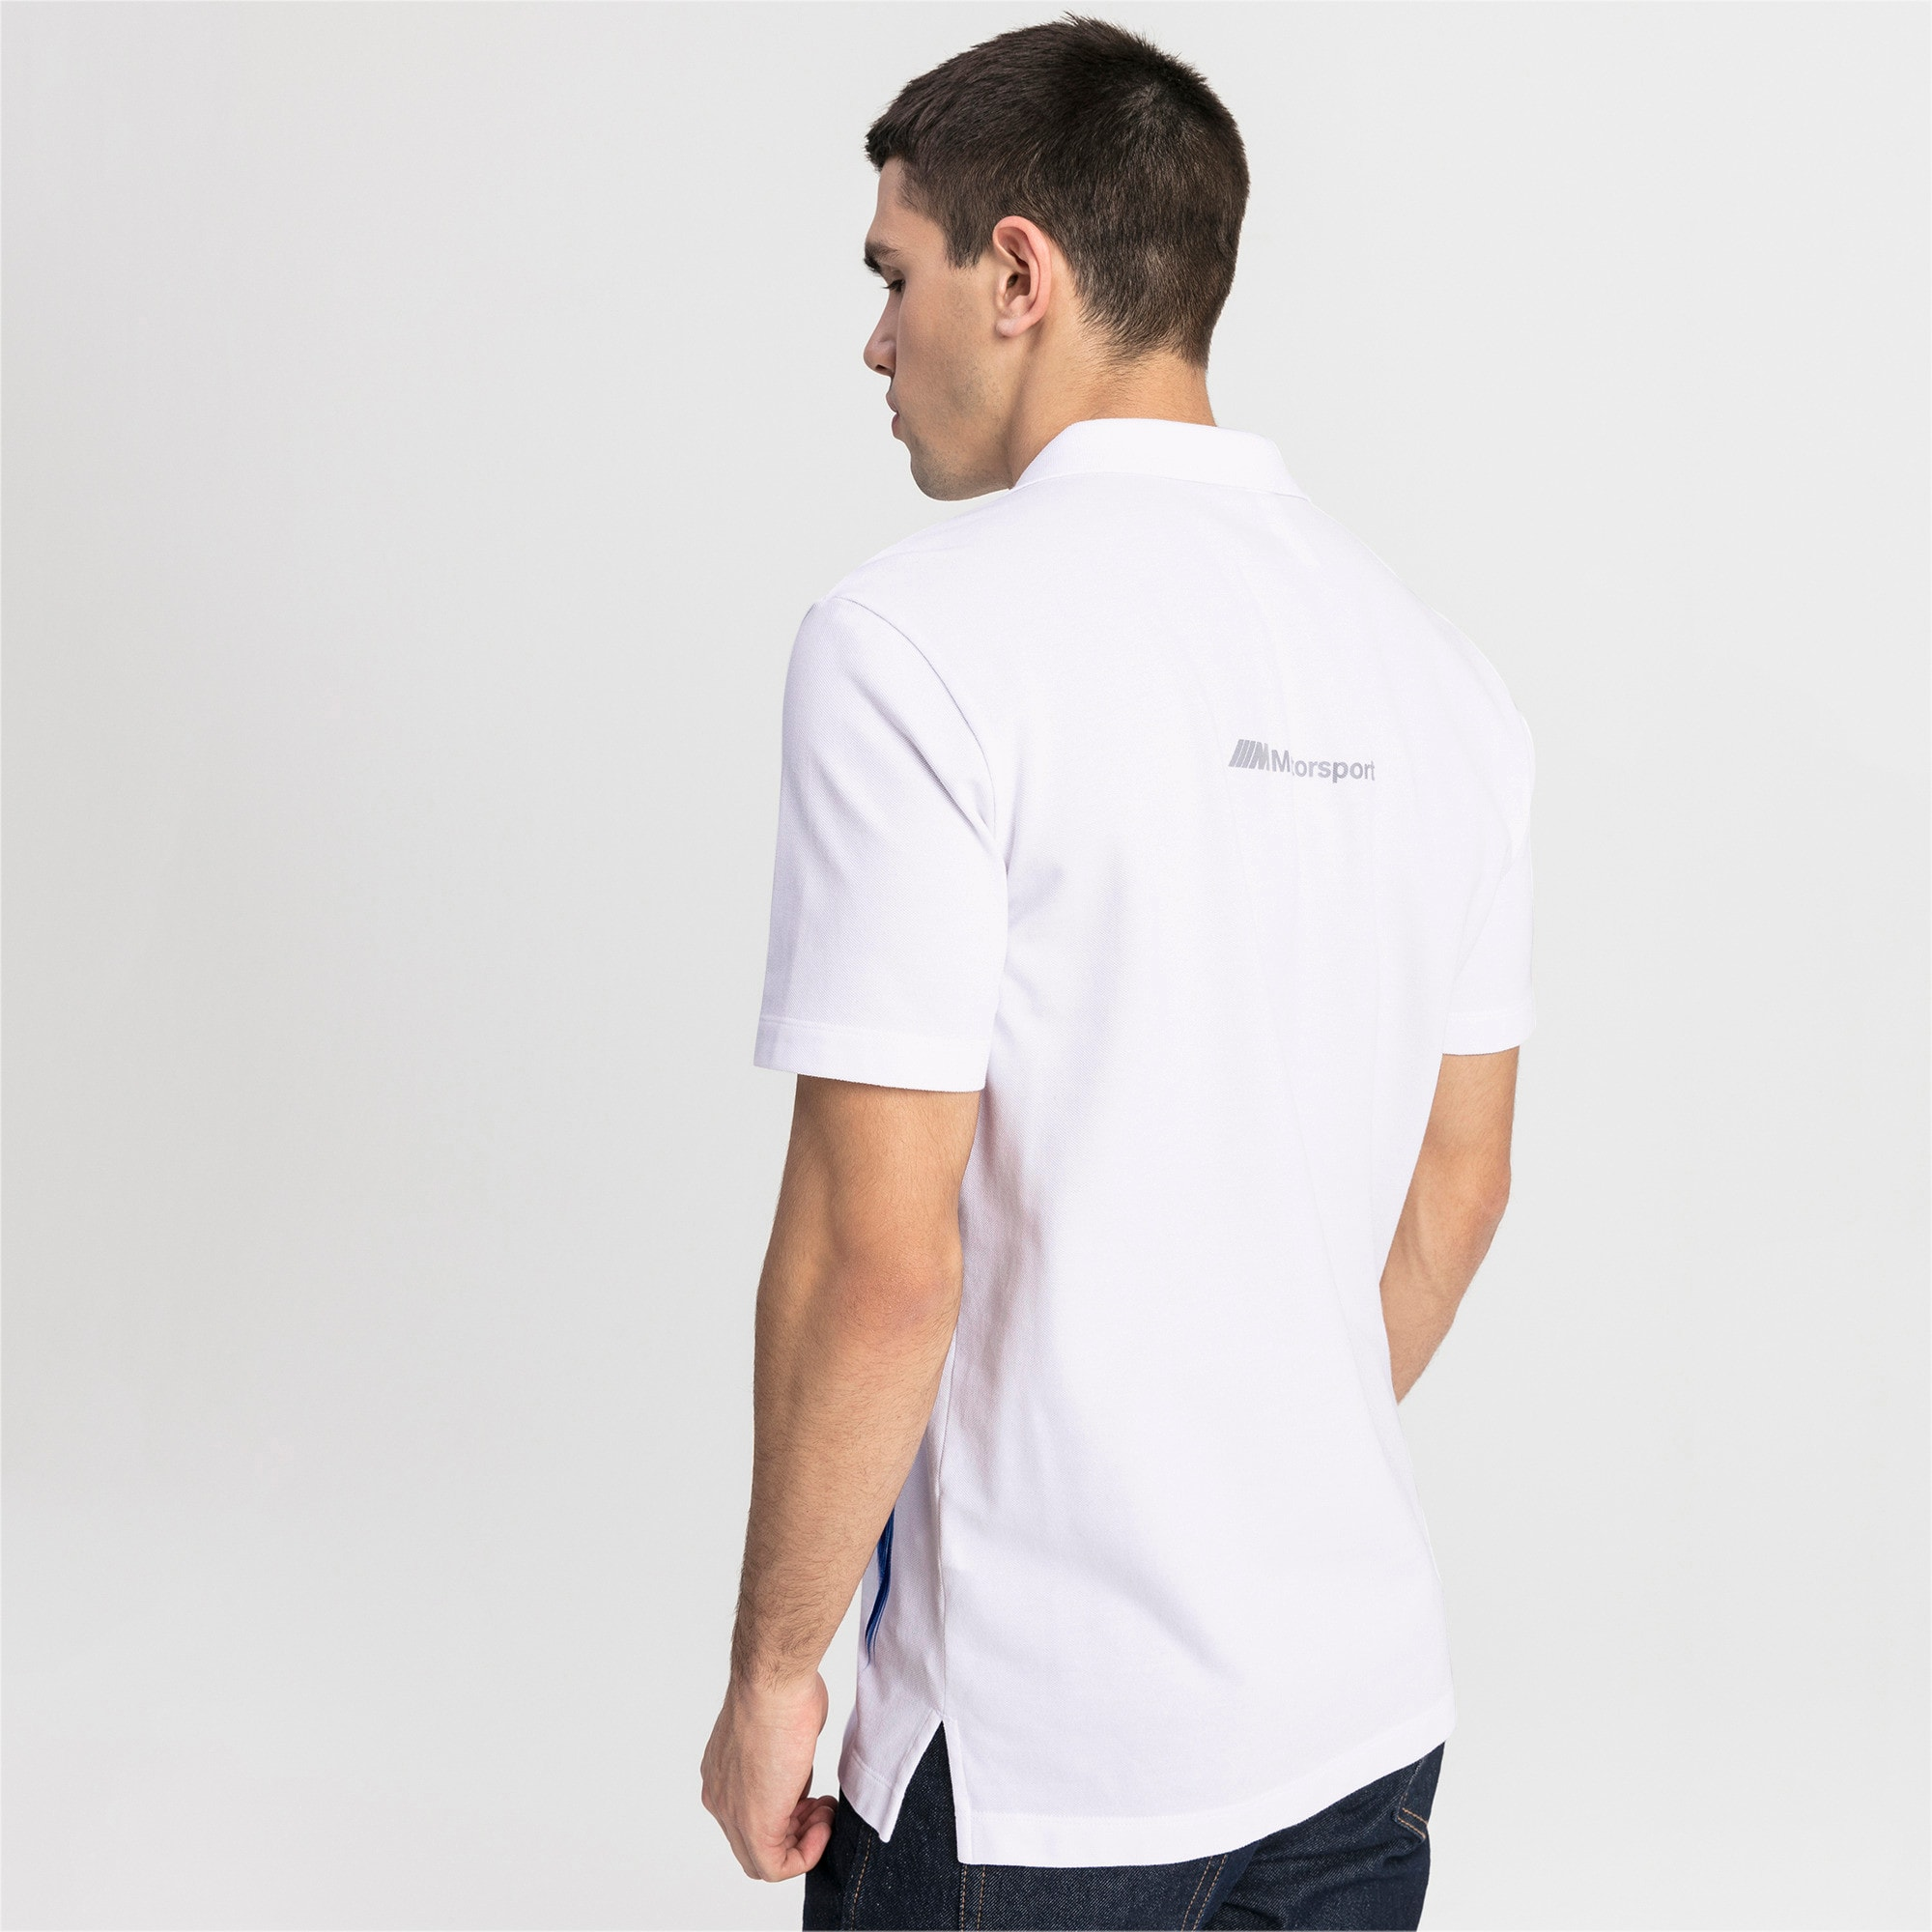 Thumbnail 2 of BMW M Motorsport Life Graphic Men's Polo Shirt, Puma White, medium